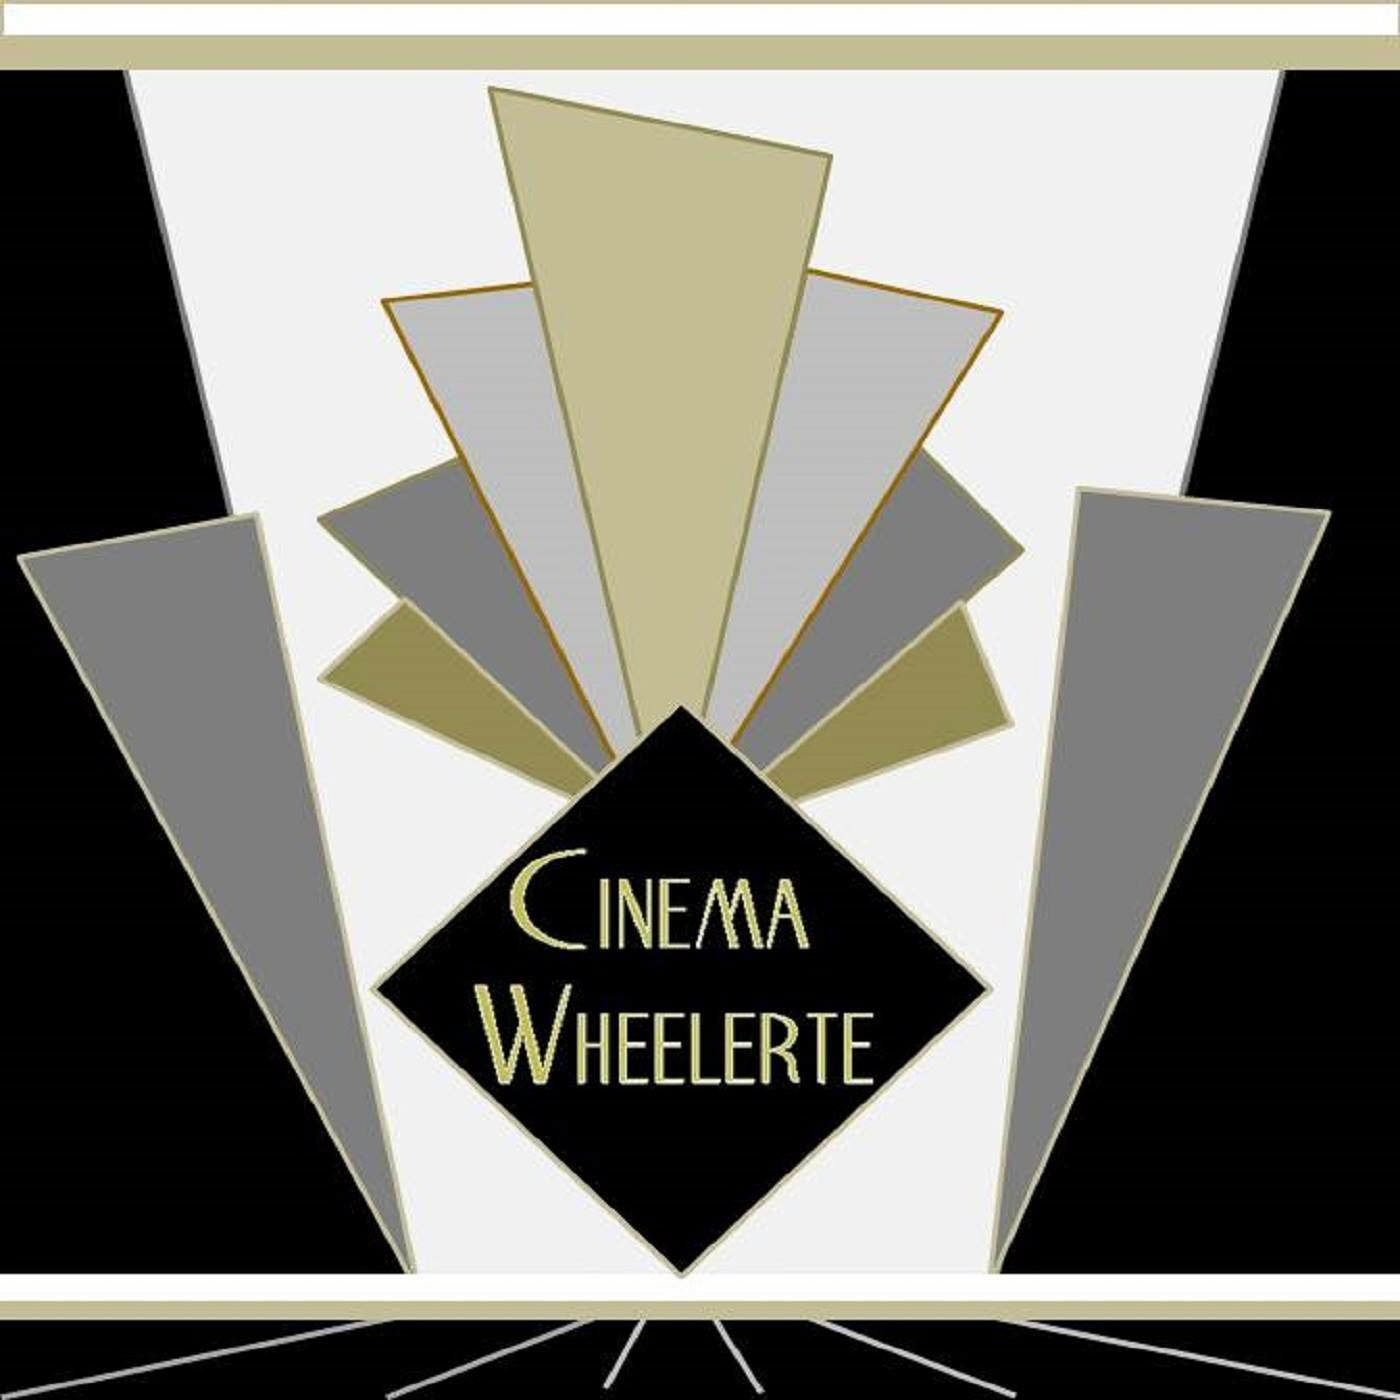 Cinema Wheelerte